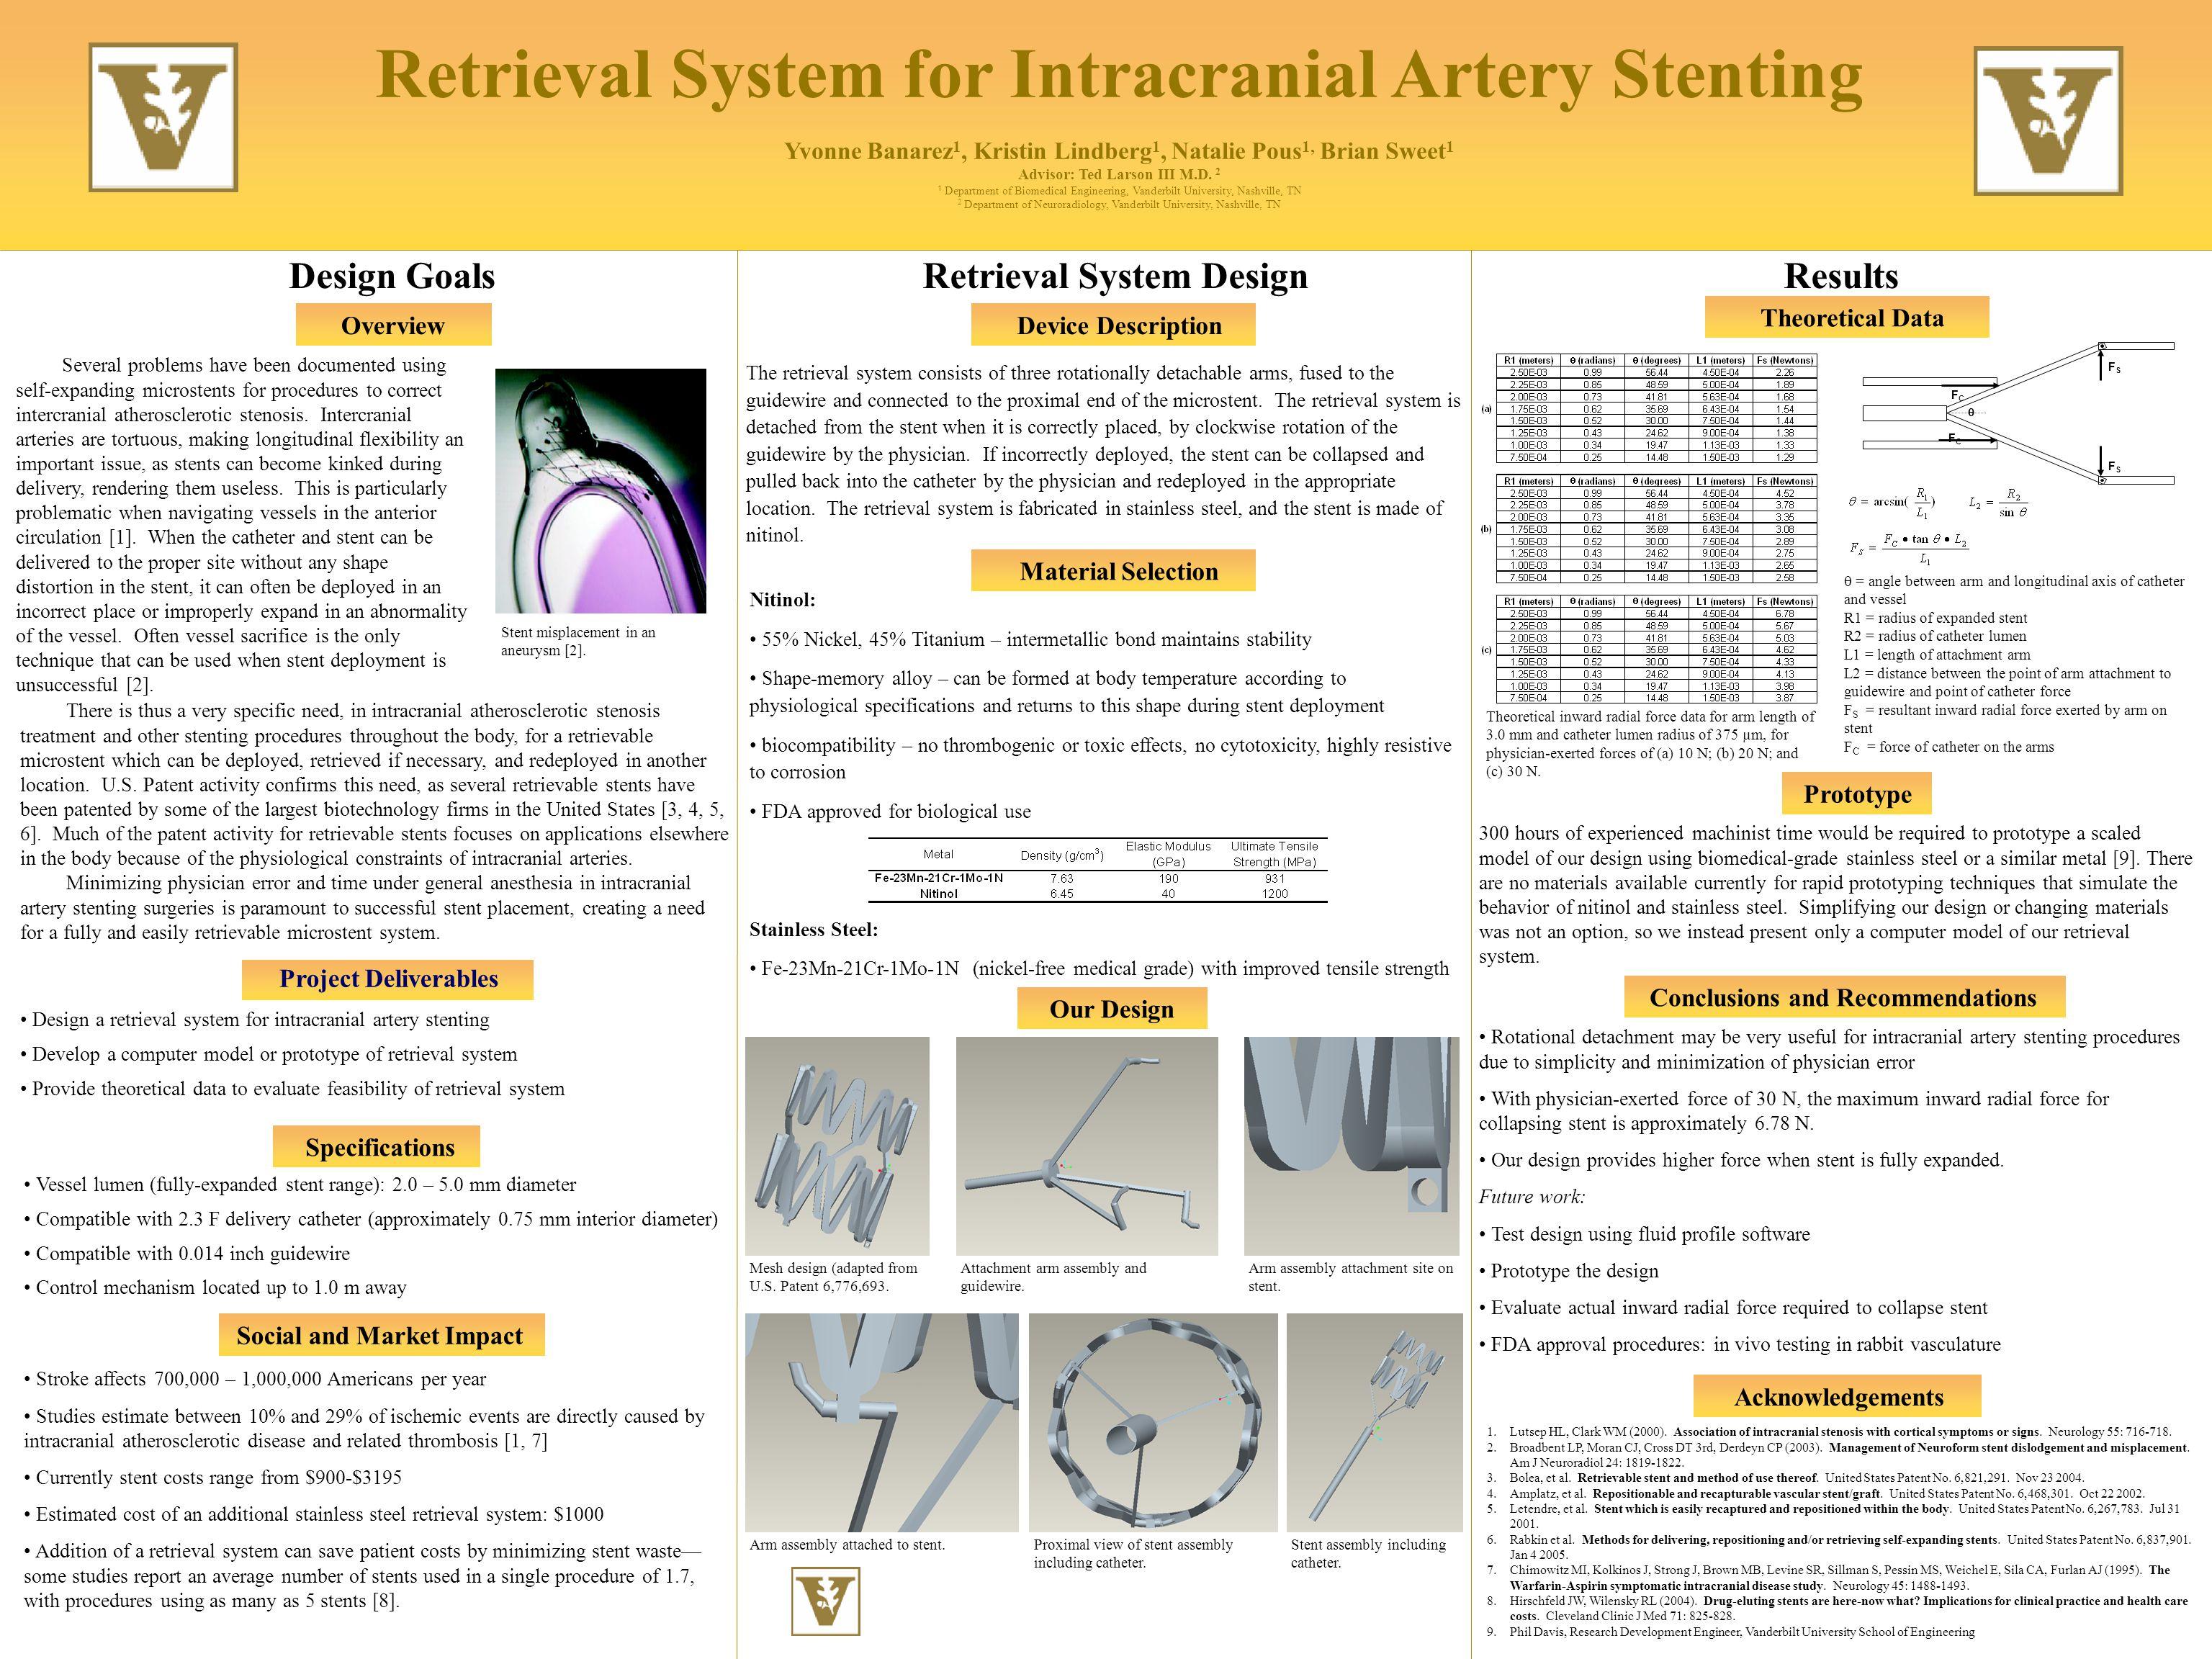 Retrieval System for Intracranial Artery Stenting Yvonne Banarez 1, Kristin Lindberg 1, Natalie Pous 1, Brian Sweet 1 Advisor: Ted Larson III M.D.